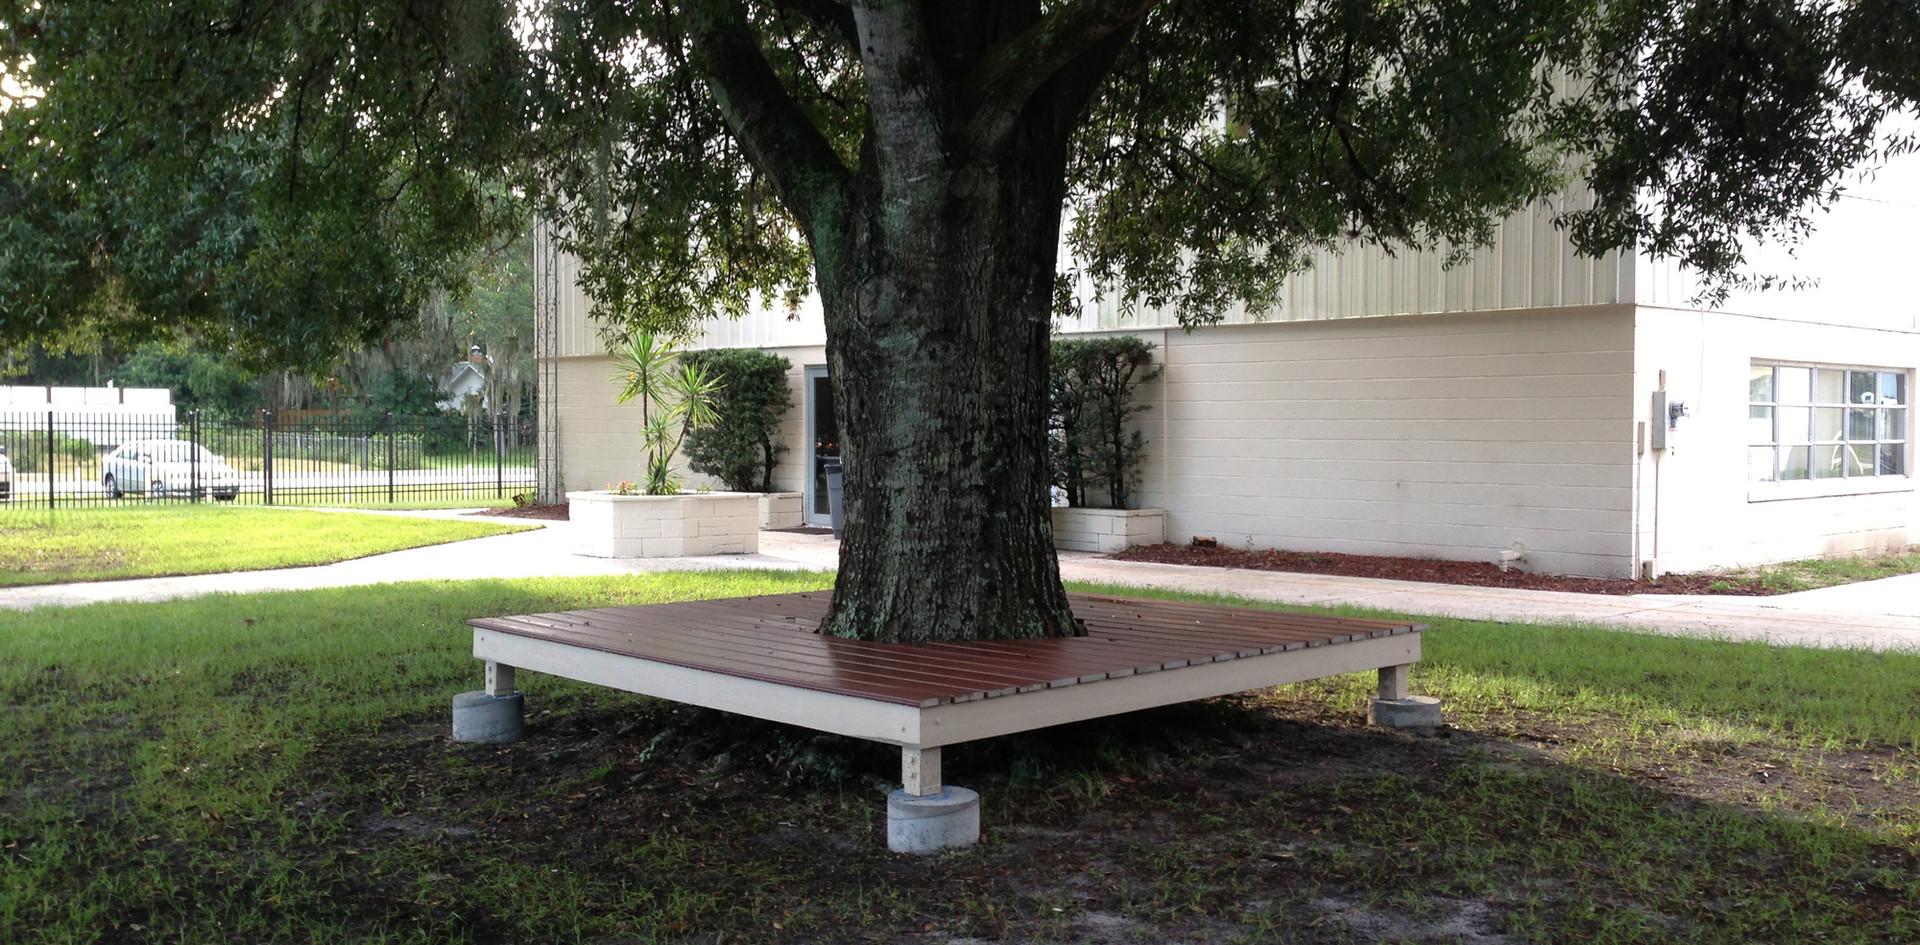 Senior Gift - Tree Bench